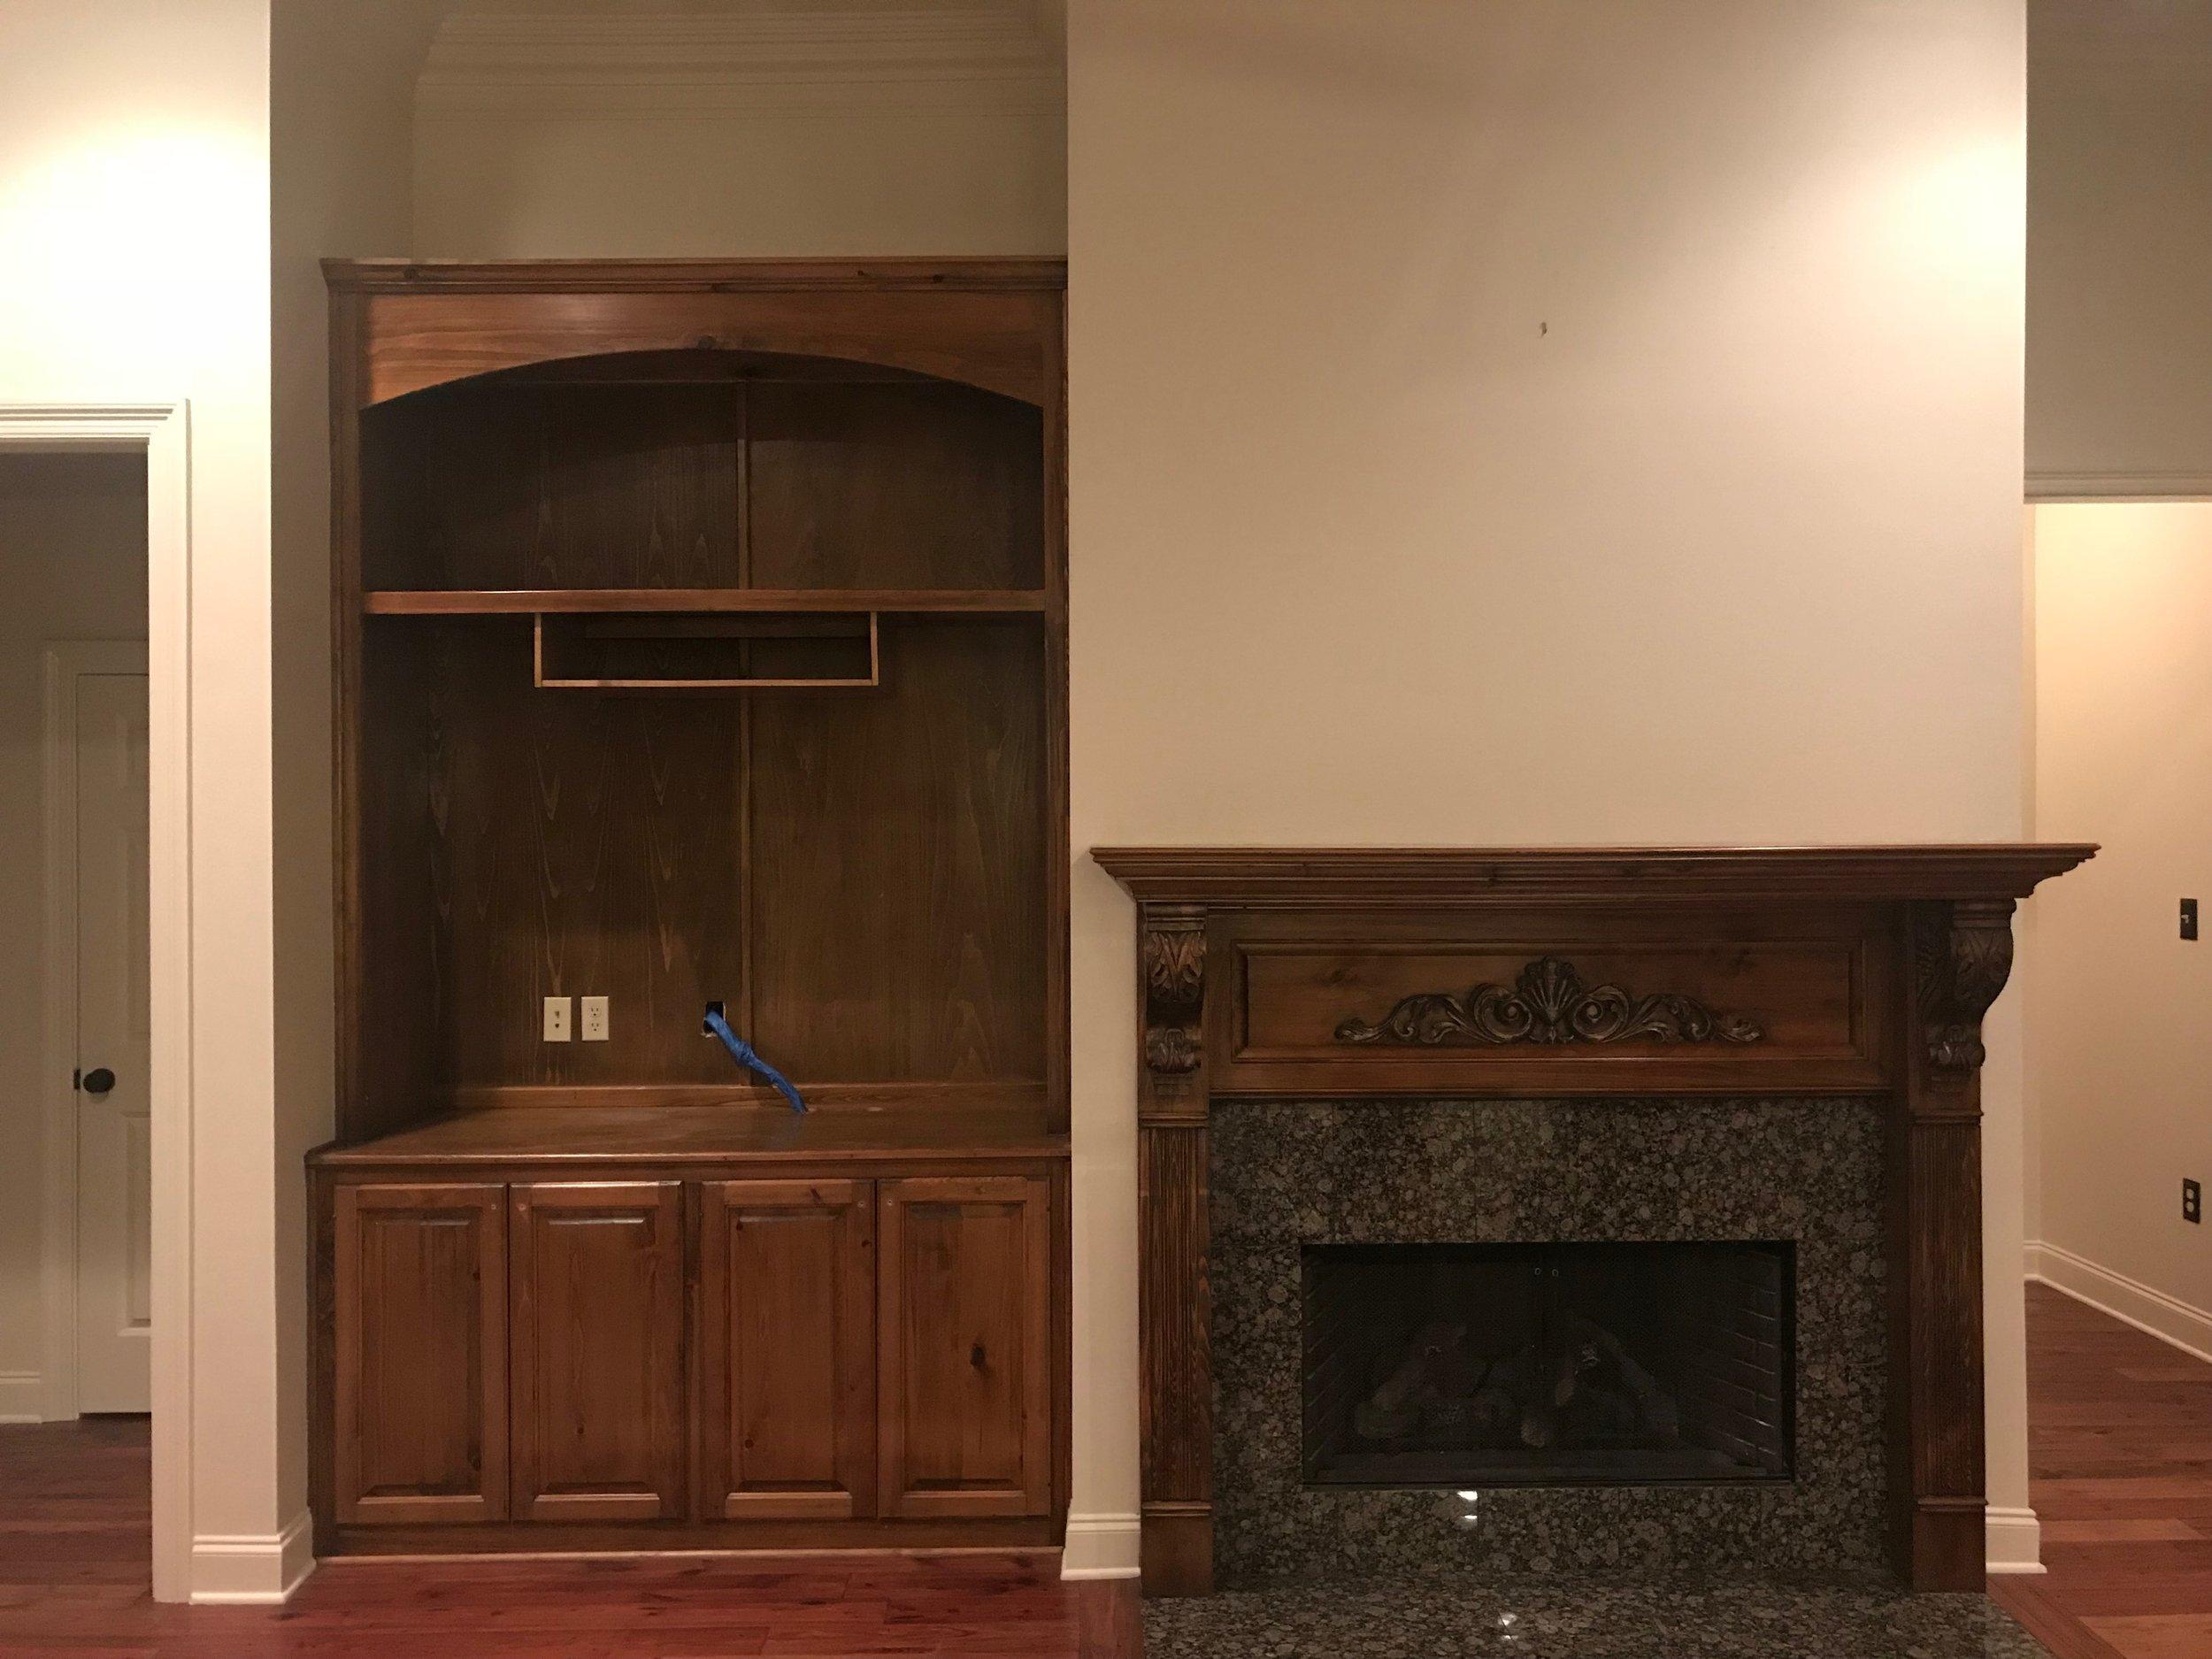 livingroom before_4197.jpeg